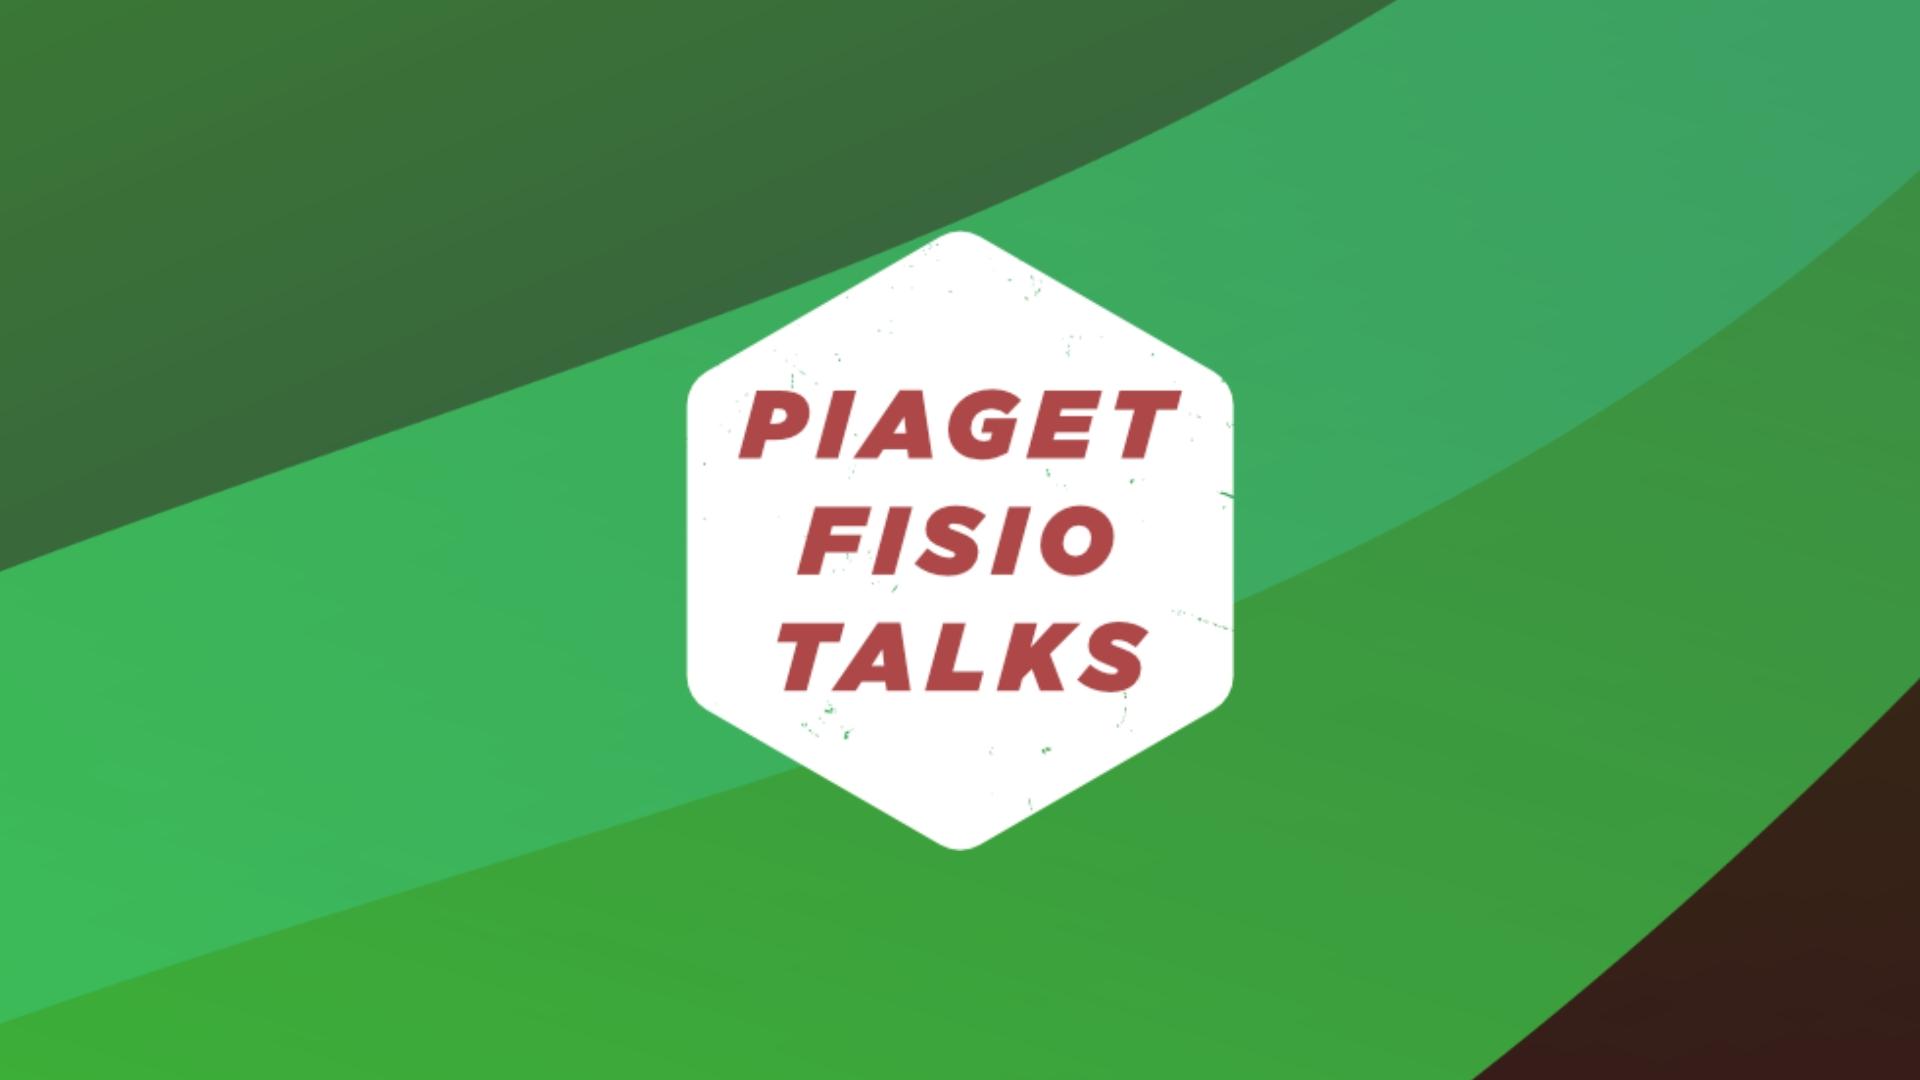 Piaget Fisio Talks debatem peso elevado na infância